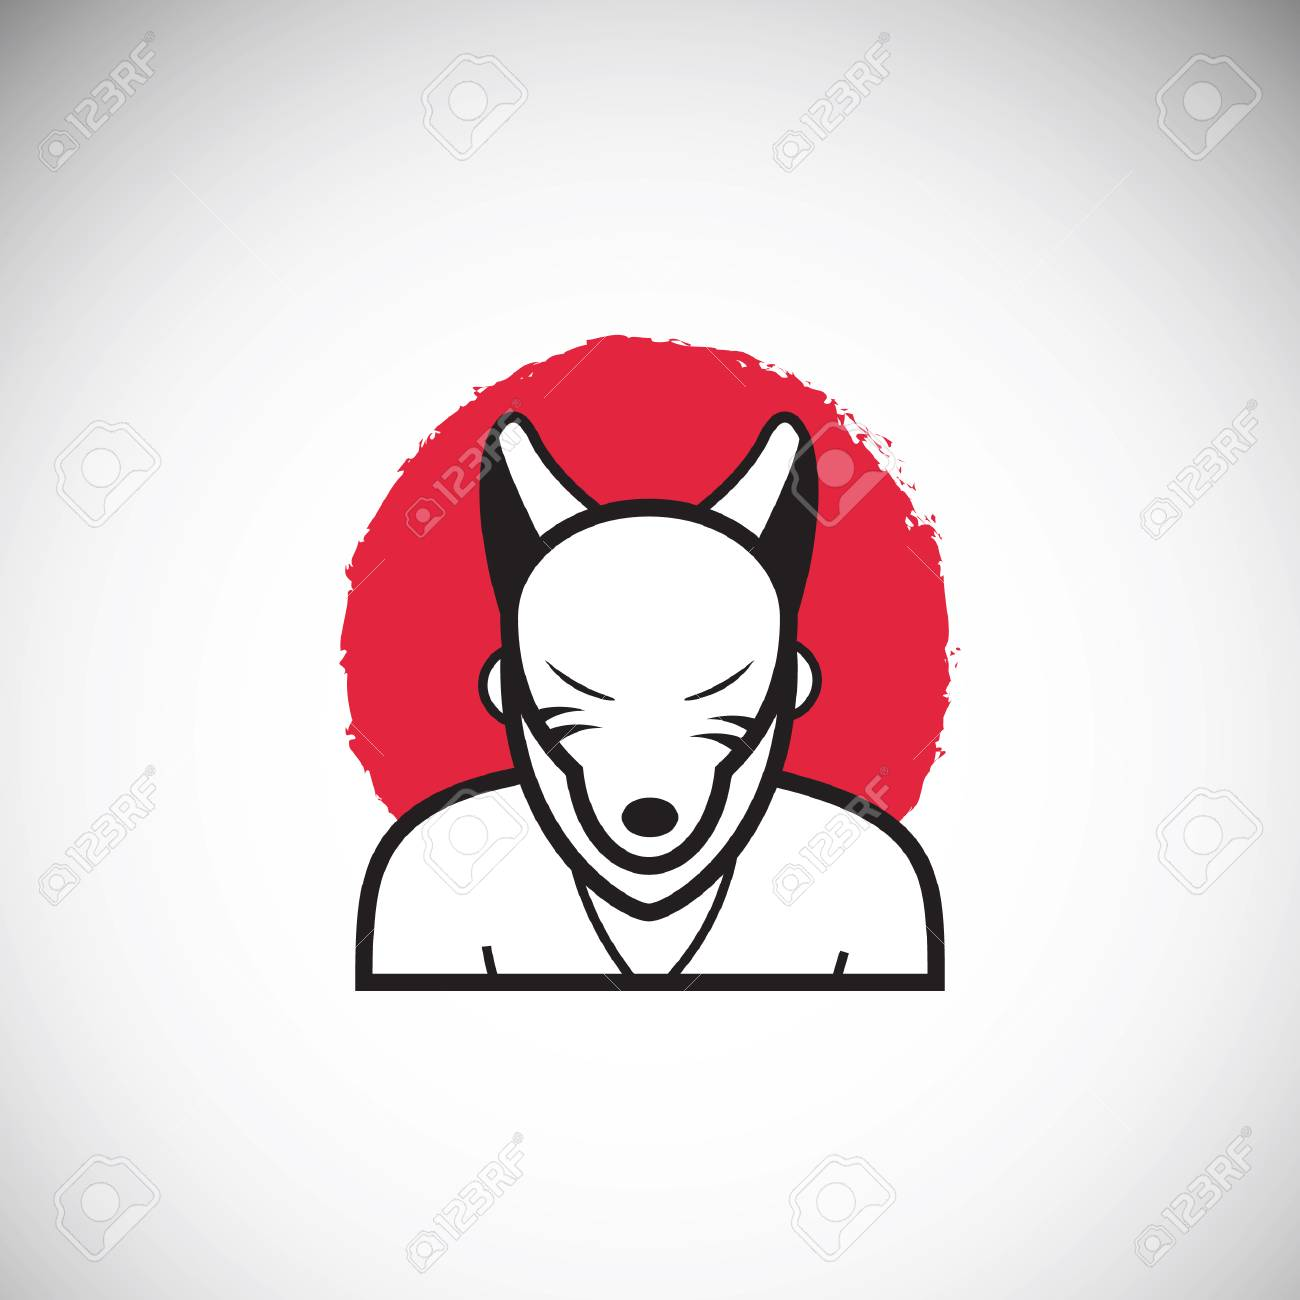 Japanese Kitsune Mask Royalty Free Cliparts Vectors And Stock Illustration Image 49748305